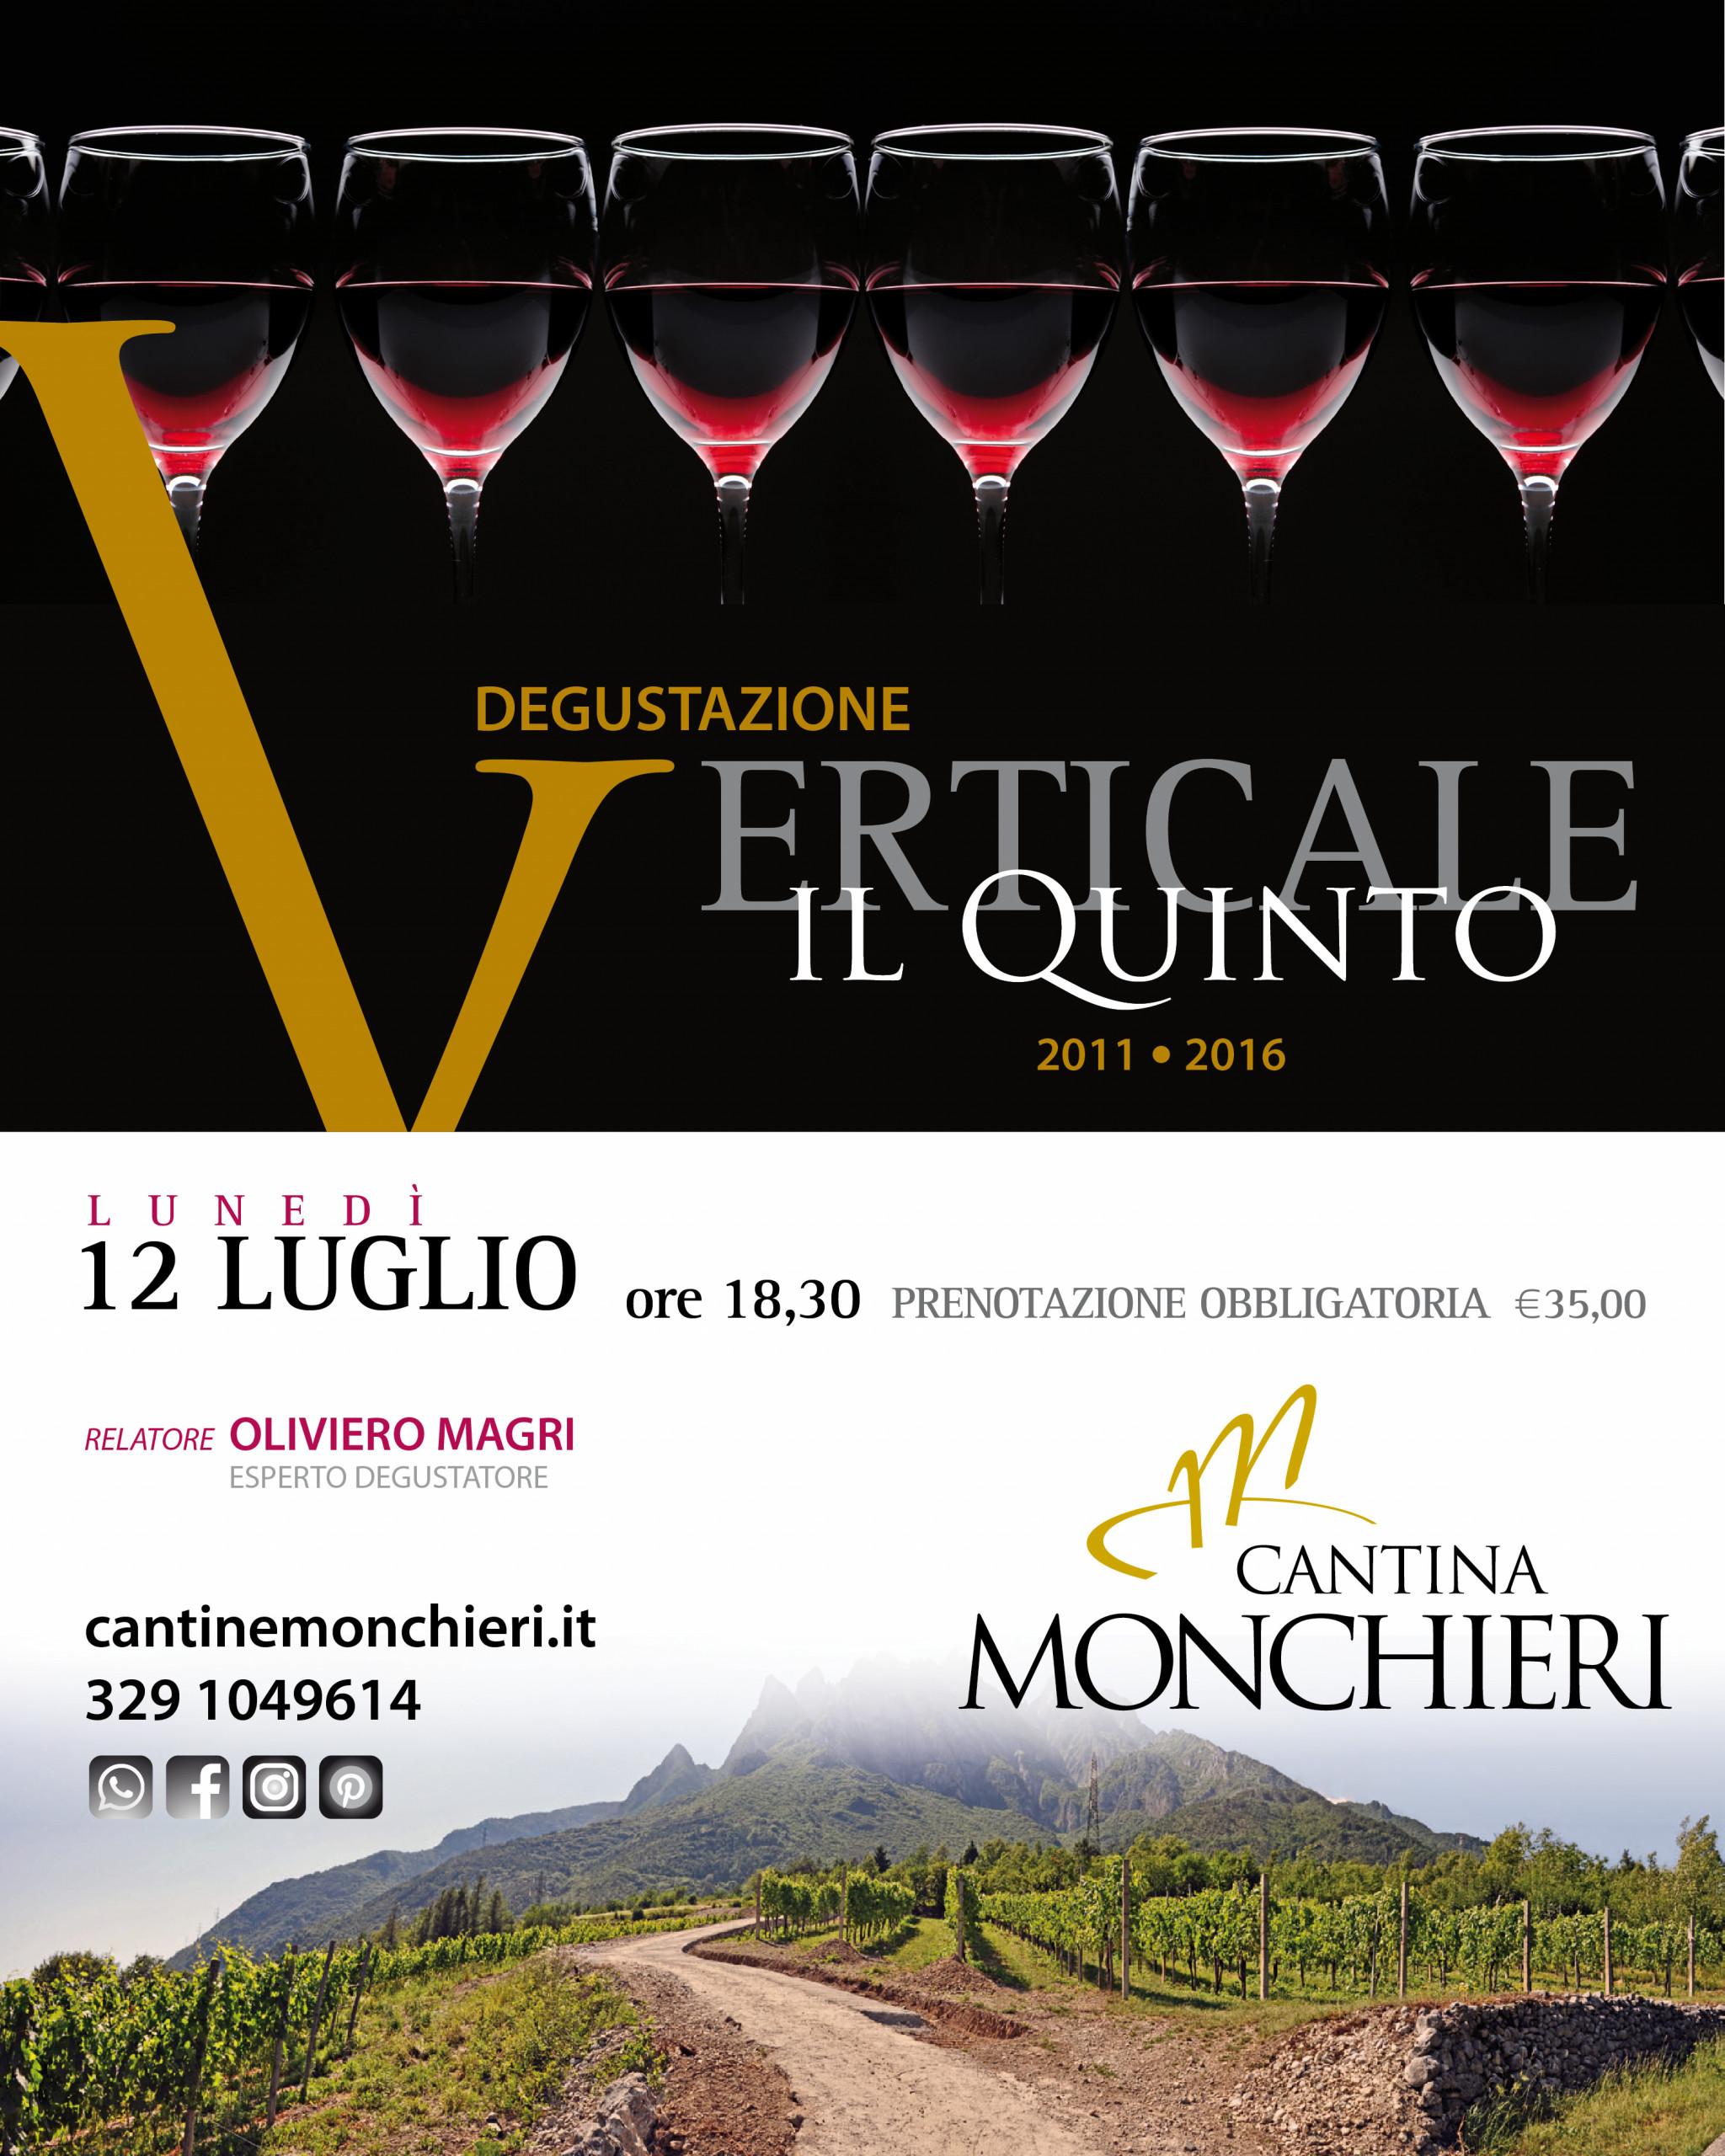 cantina-monchieri-concarena-valle-camonica-vigneto